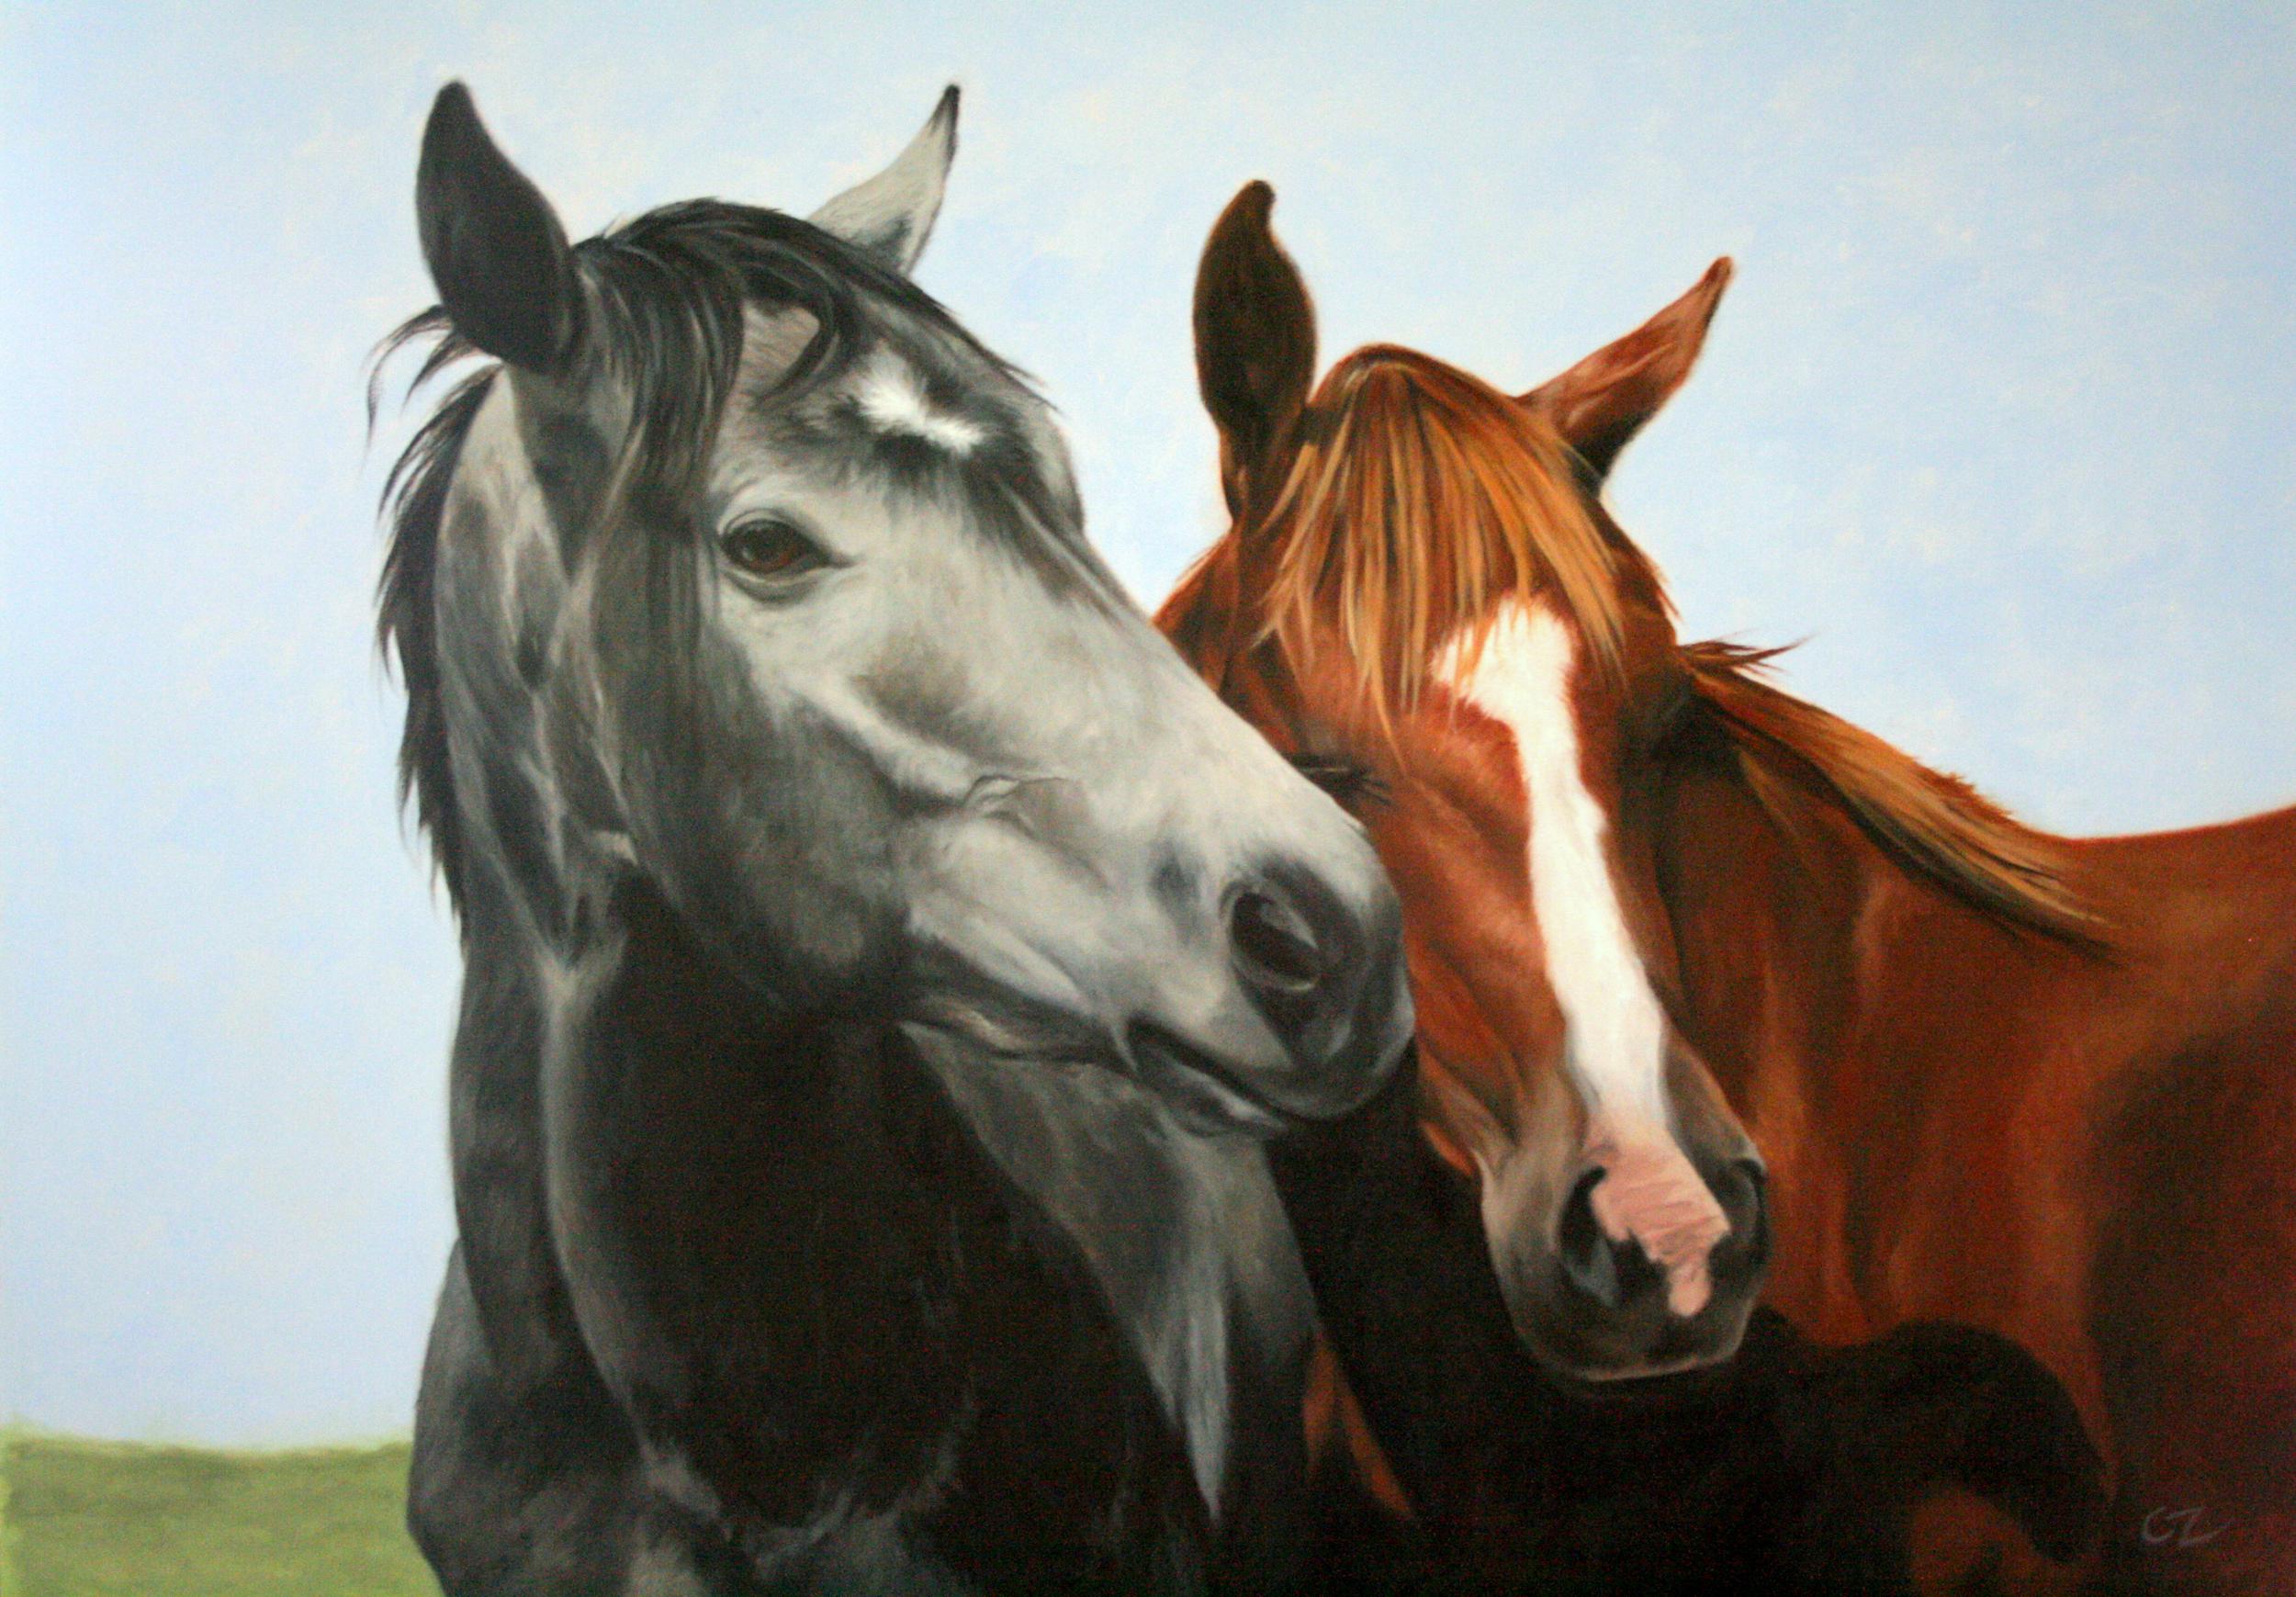 curtiss_horseslarge_330dpi.jpg